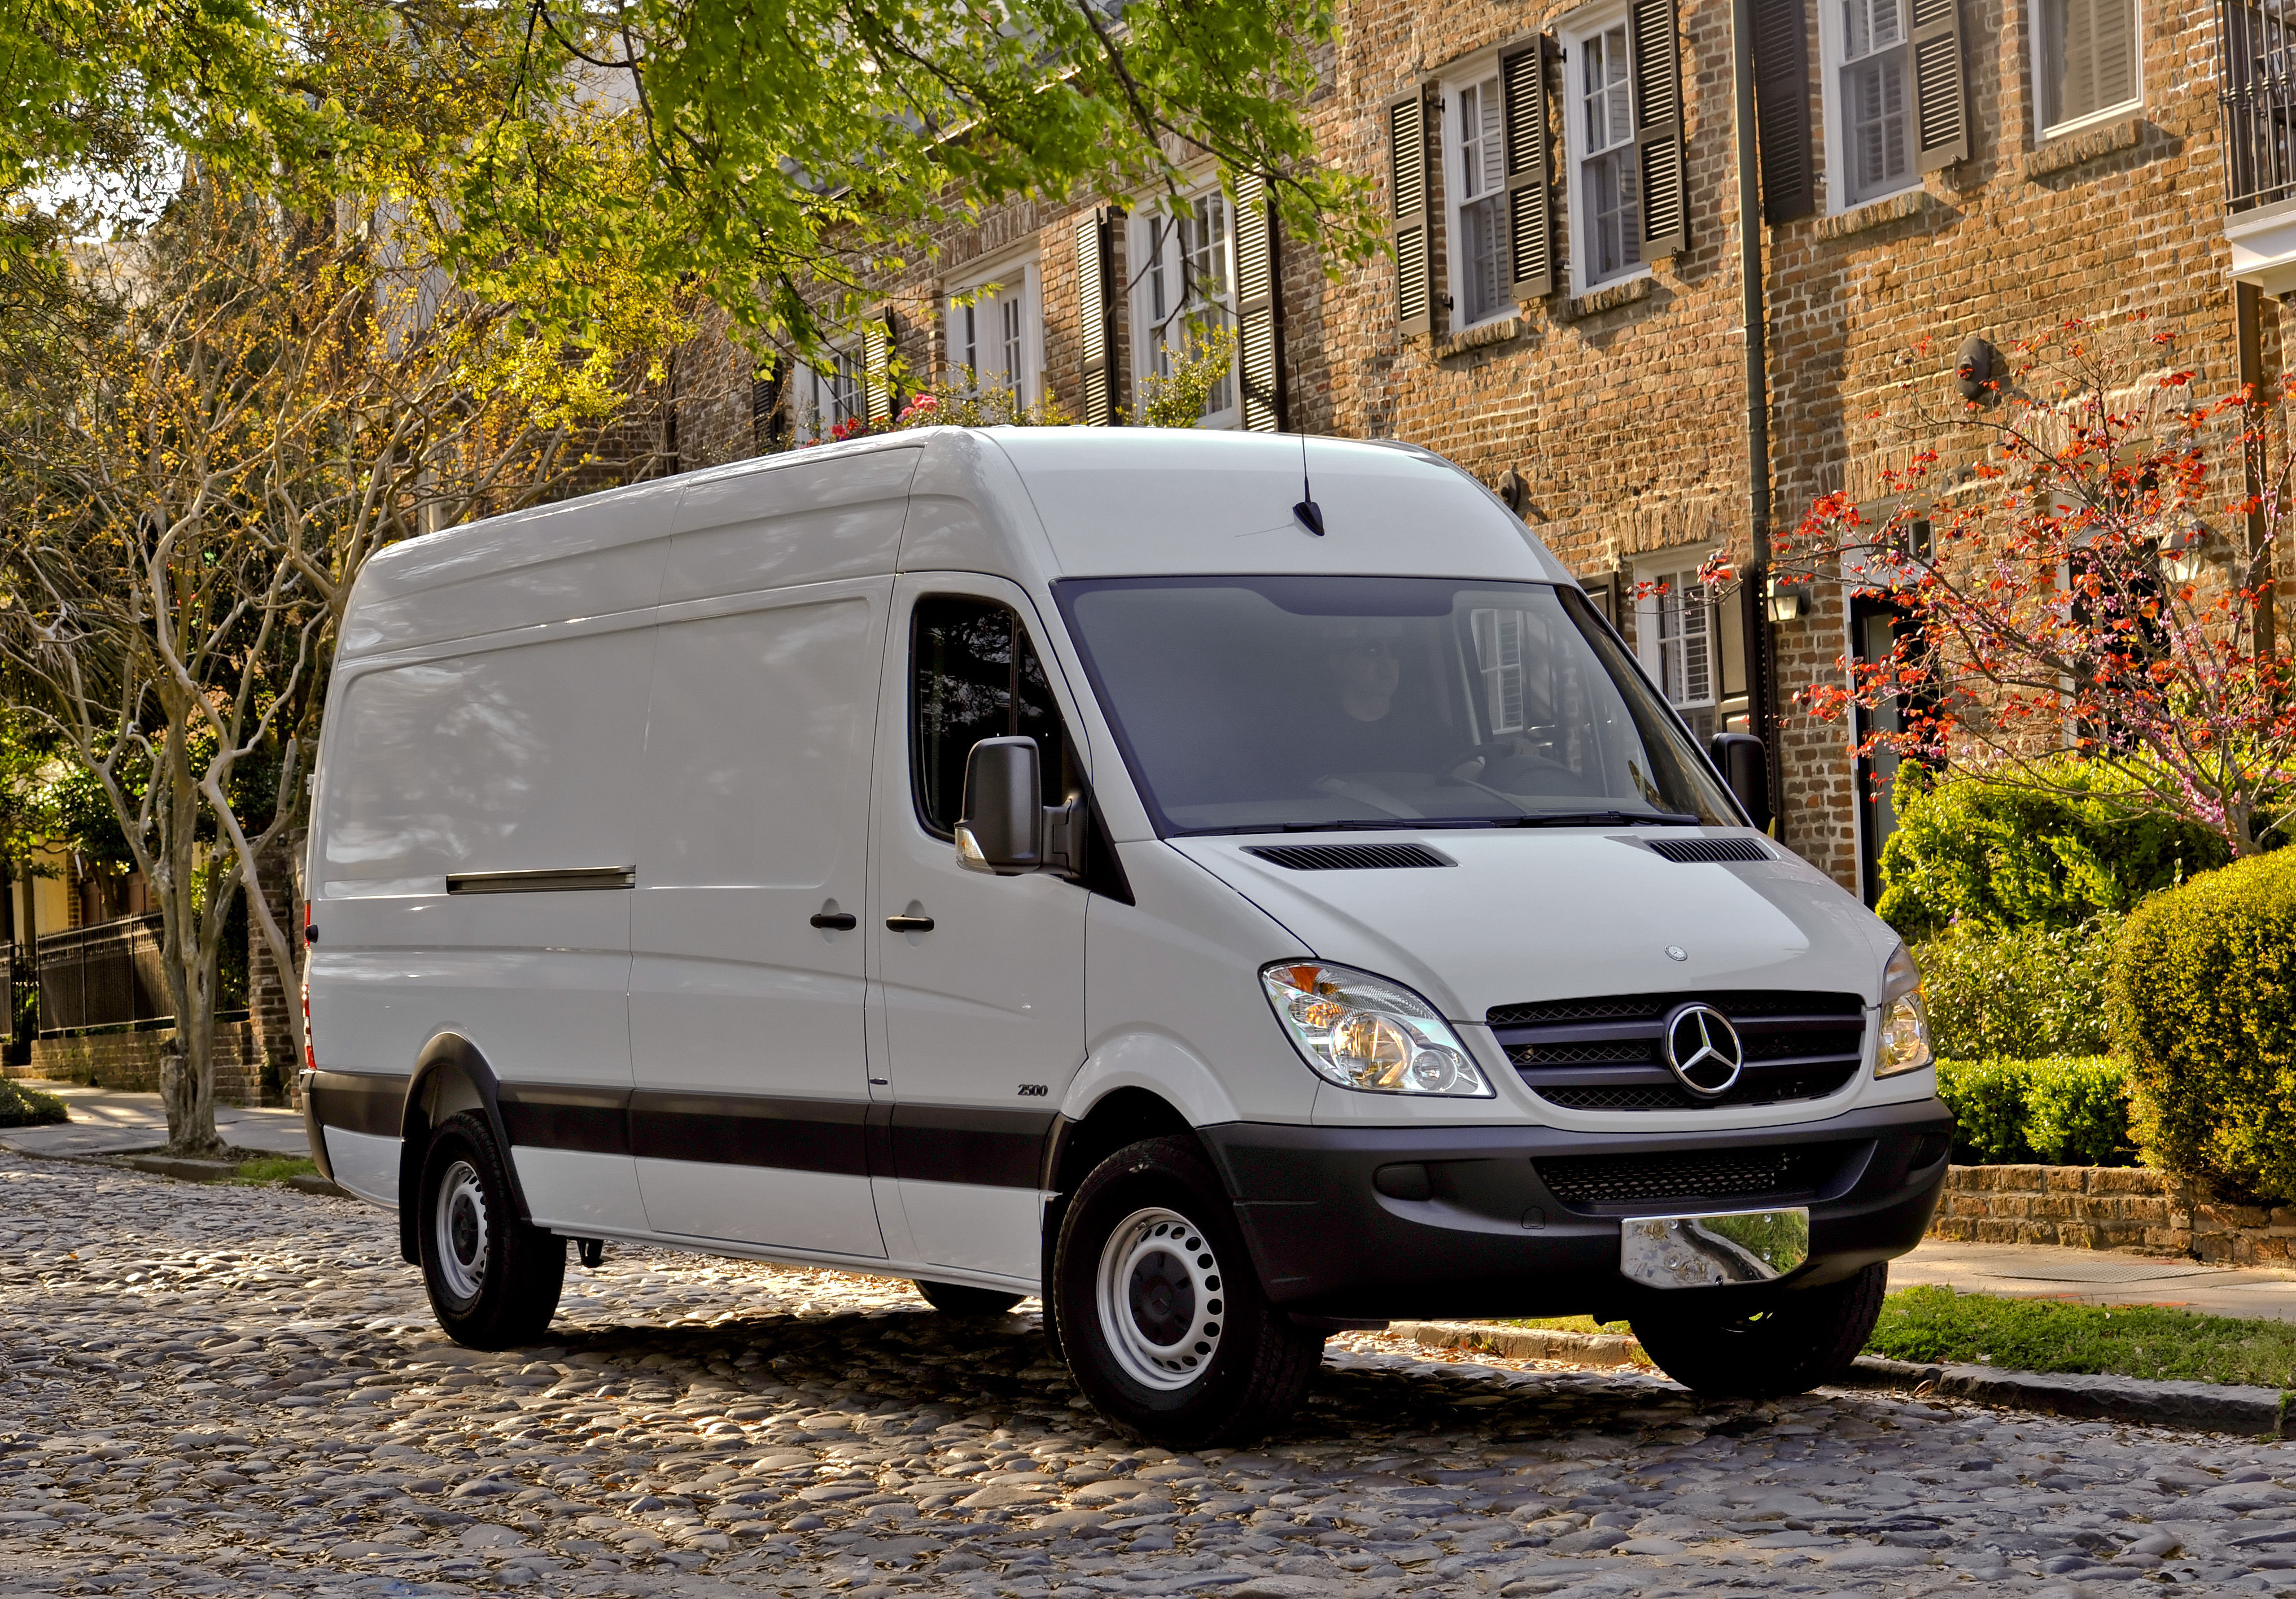 Sprinter 2500 170 wb cargo van